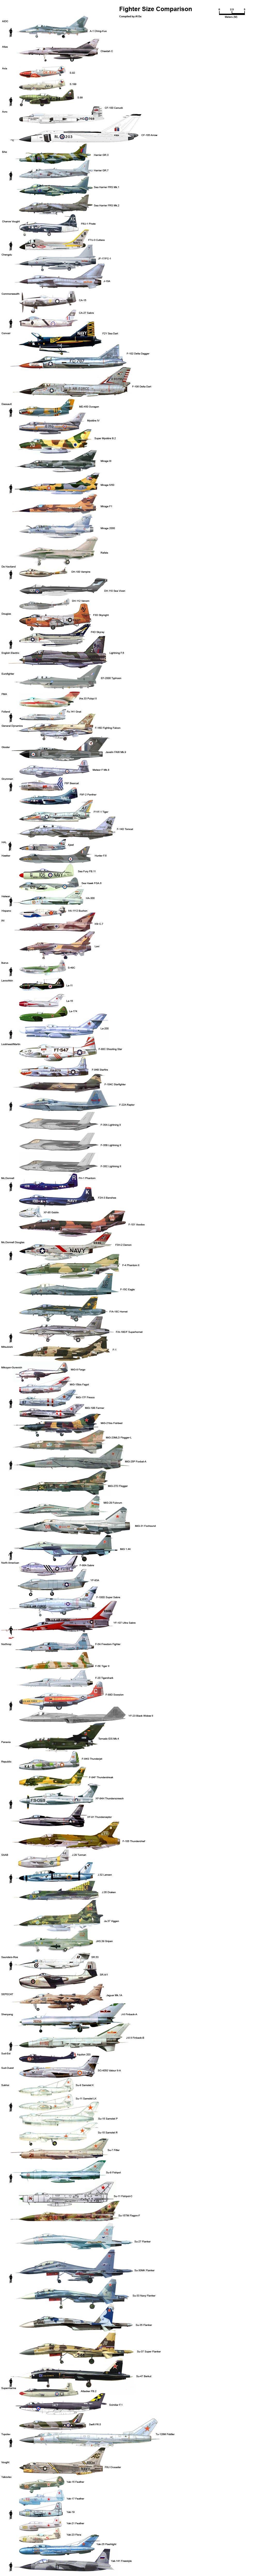 Fighter-Jet-Comparisons